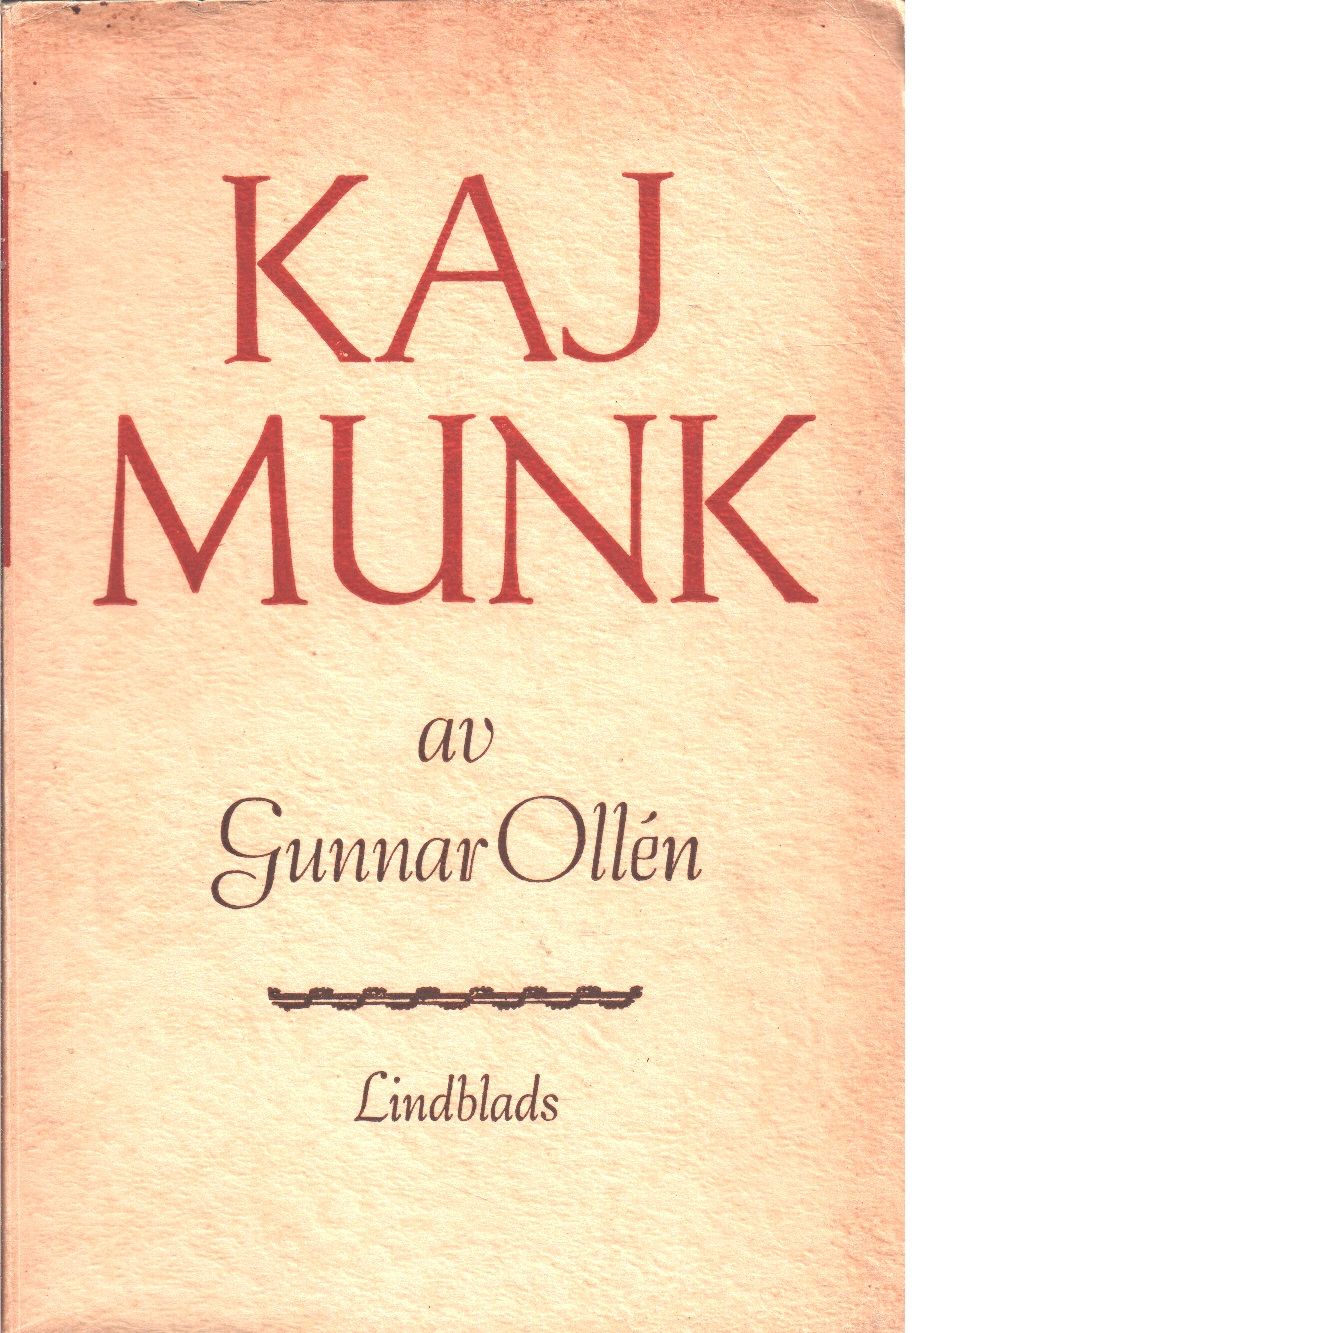 Kaj Munk - Ollén, Gunnar